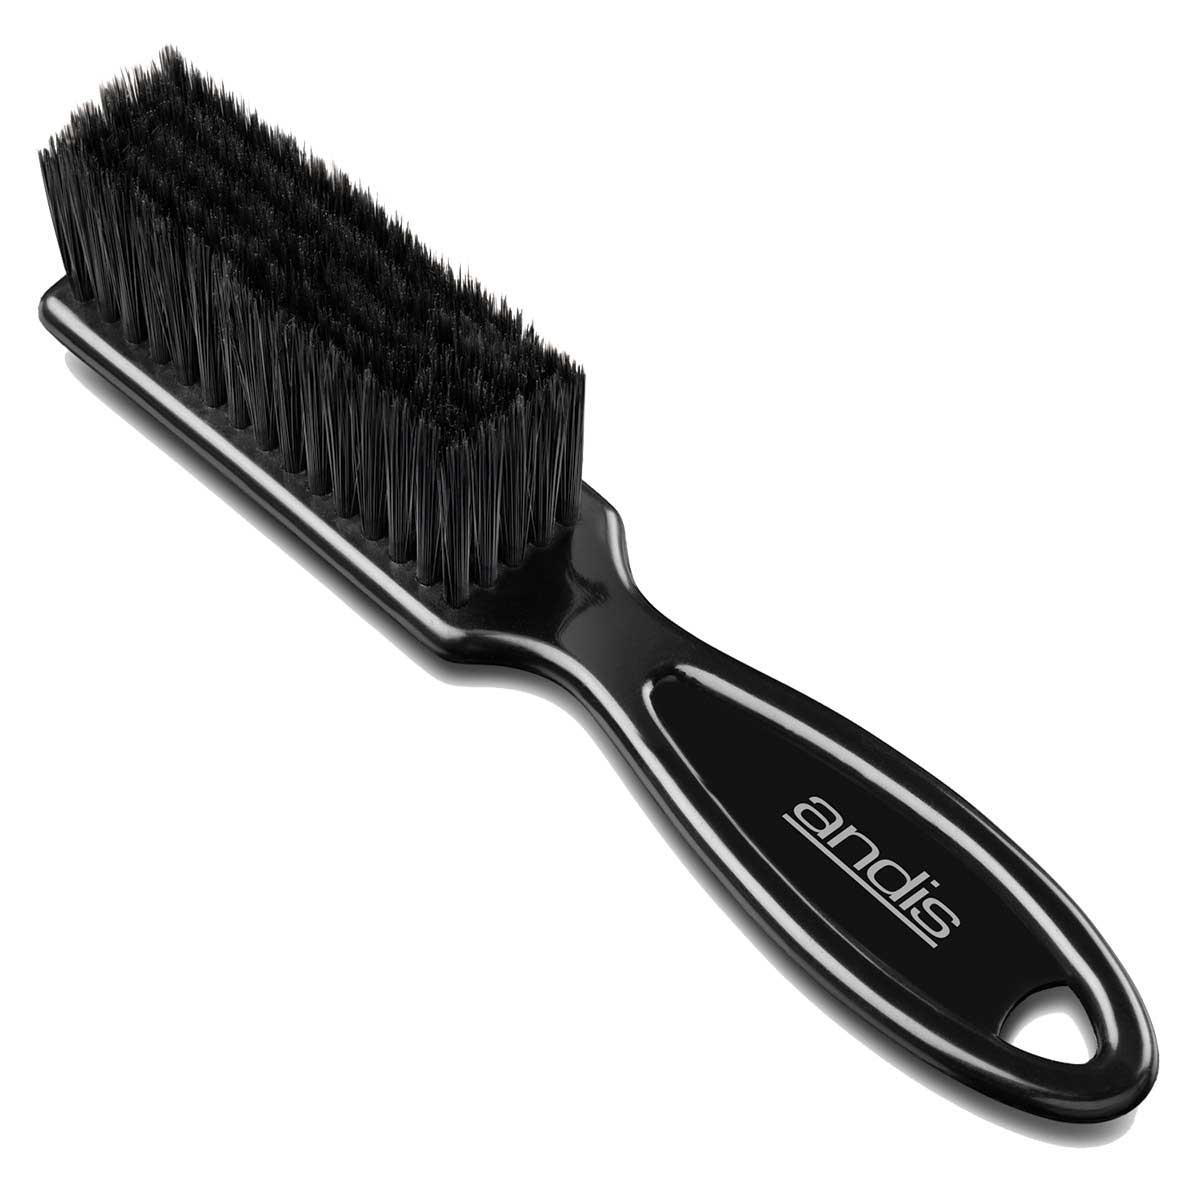 Buy Andis Blade Brush at Ryan's Pet Supplies